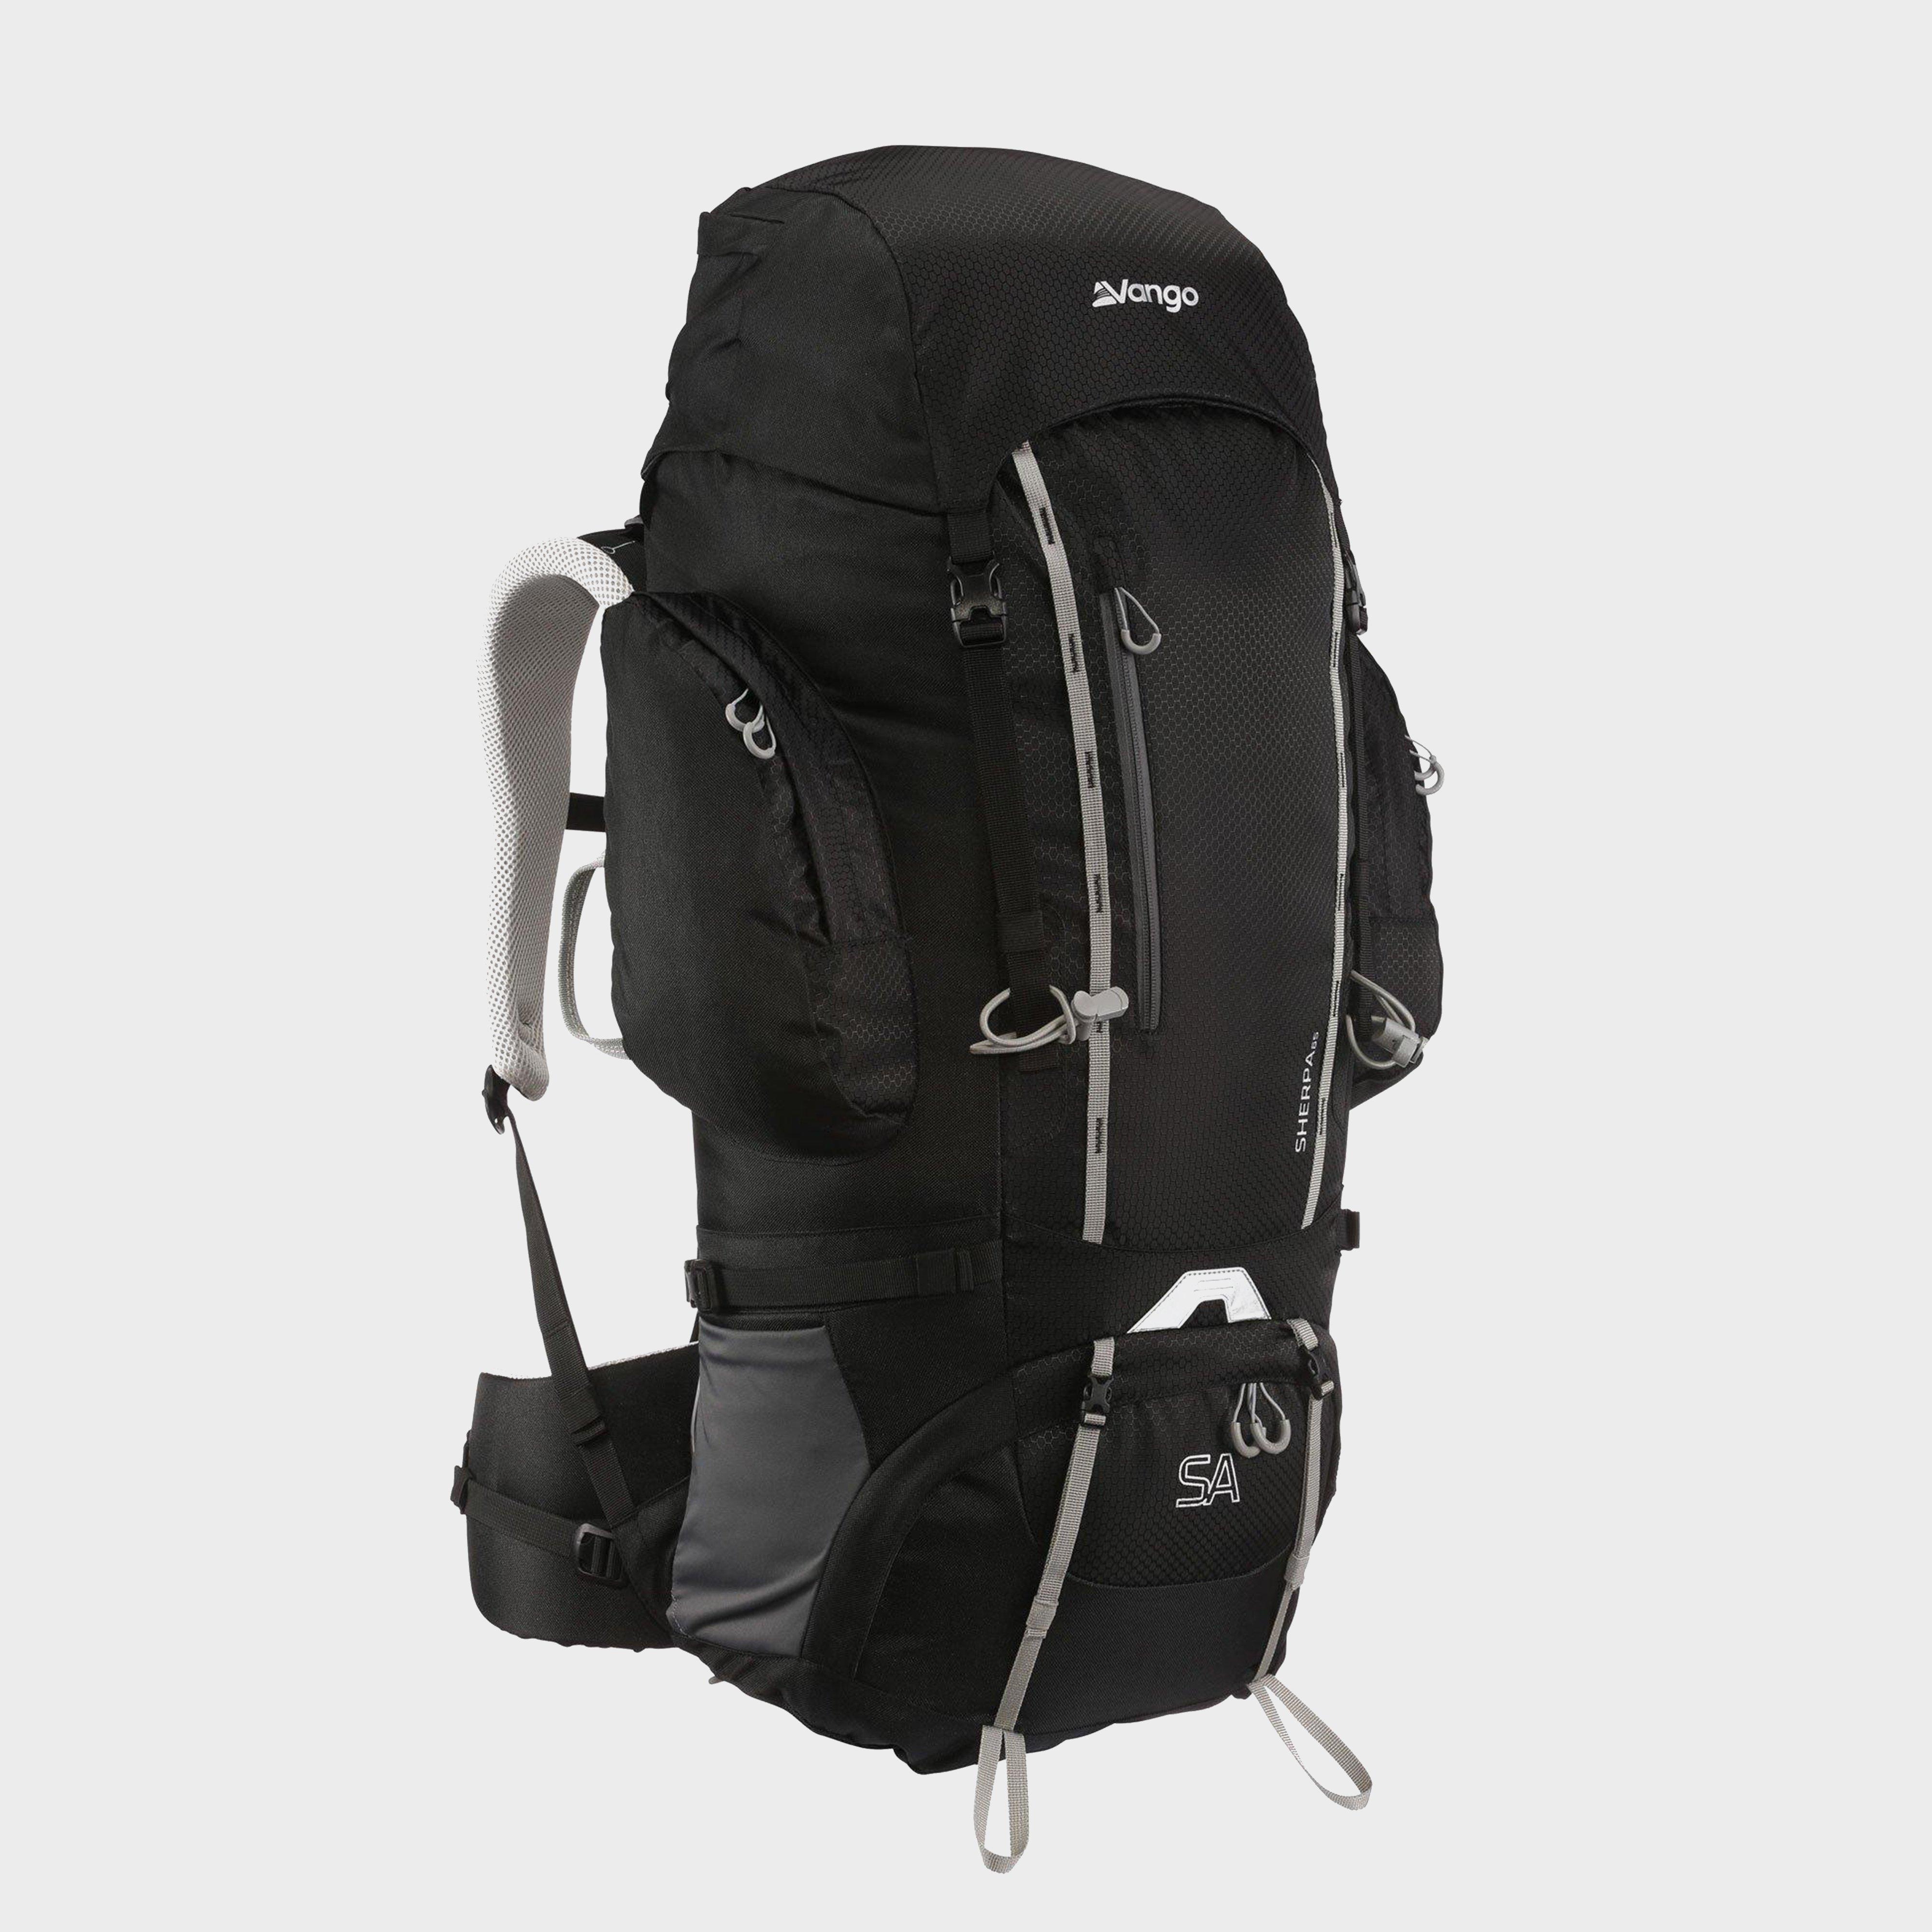 Vango Sherpa 65 Rucksack - Black/65, Black